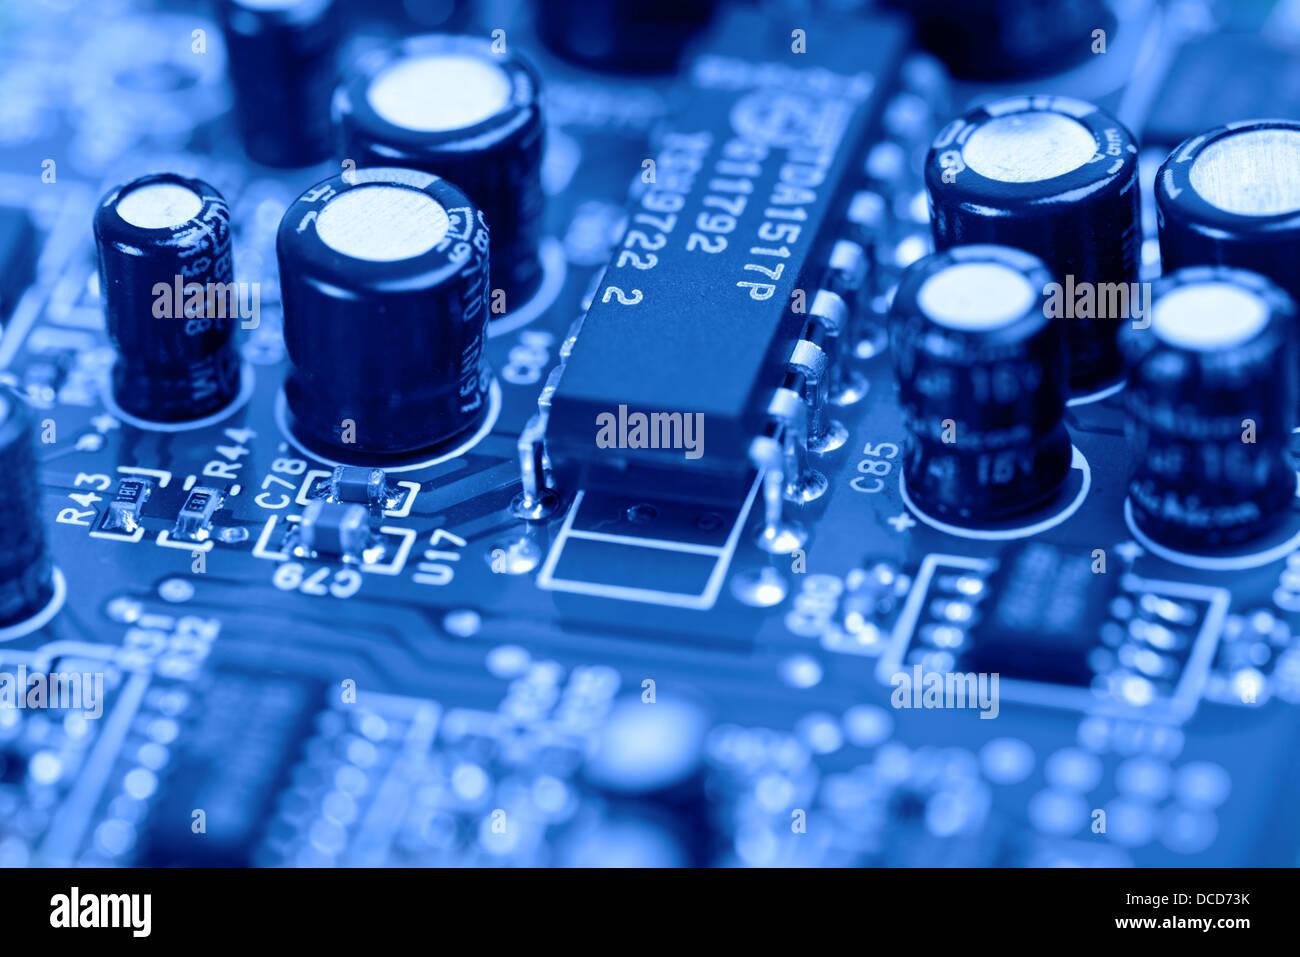 Computer-Platine in blau getönt Stockbild